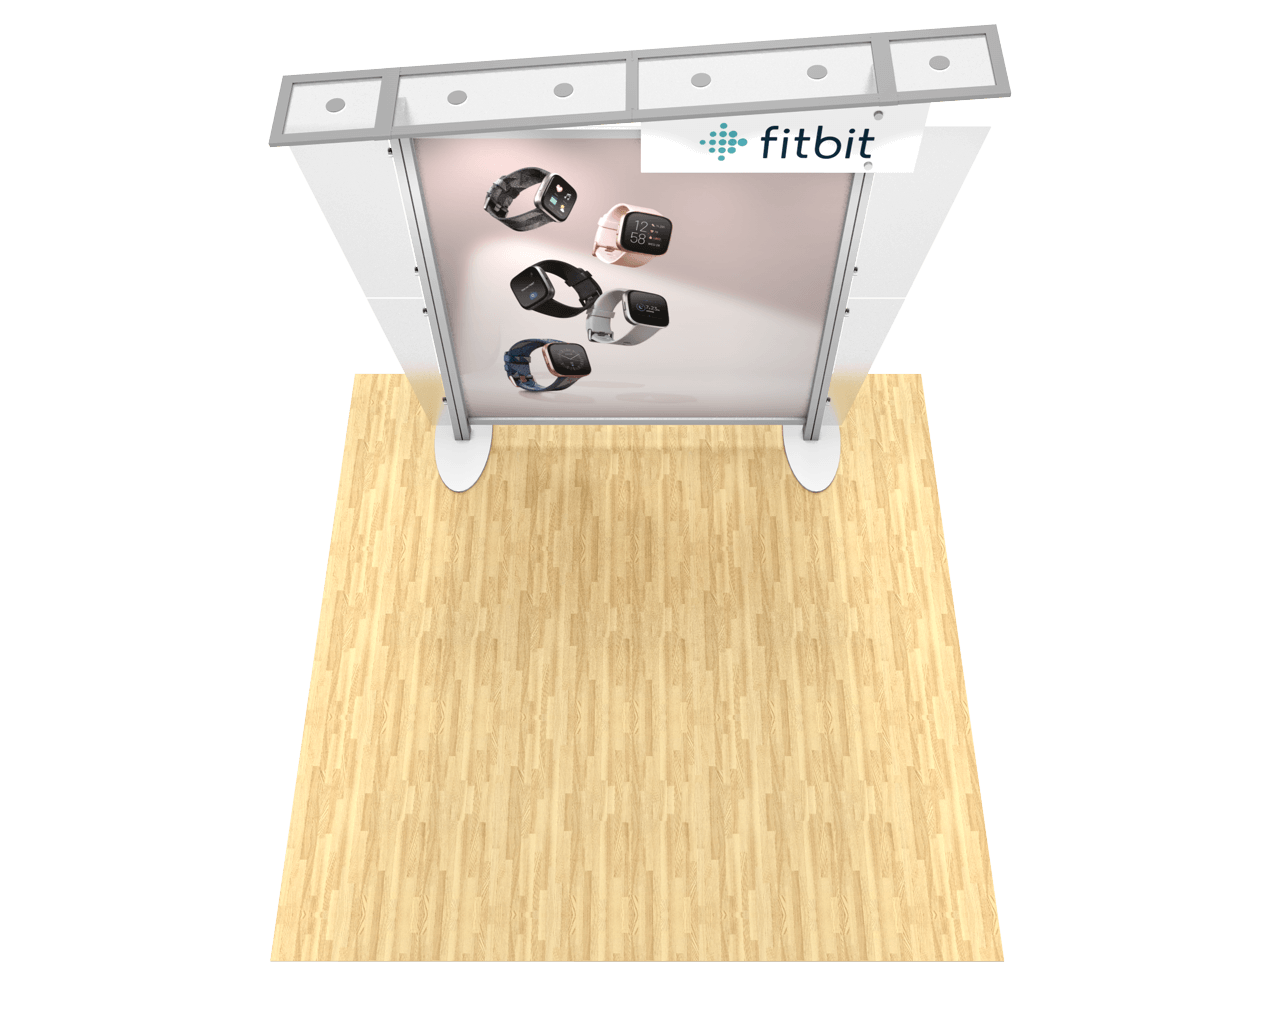 XVline XVs 10ft Trade Show Display Model